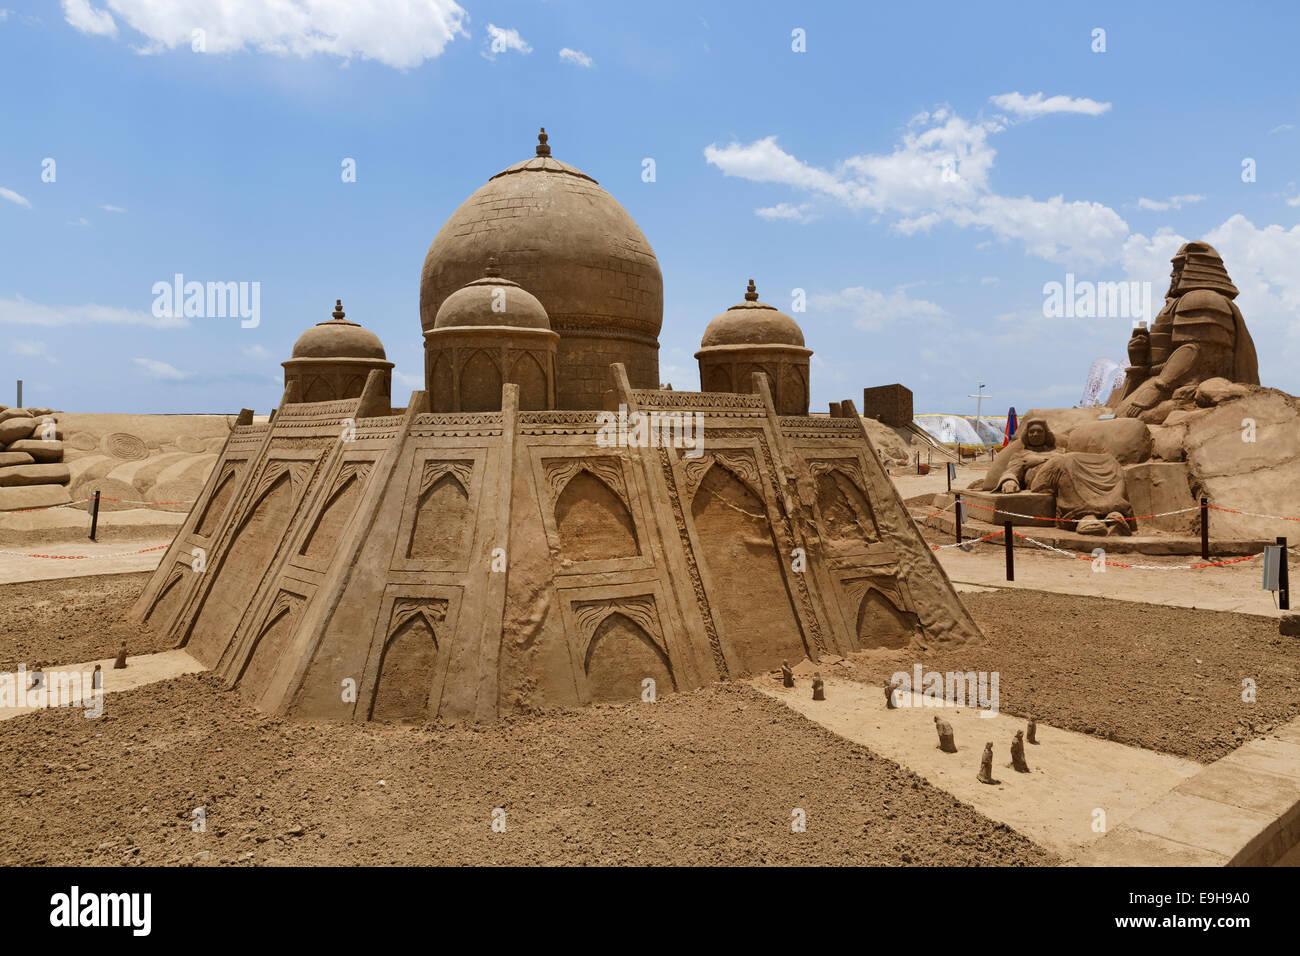 Mughal Empire Sand Sculpture by Ian Zelinka, International Antalya Sand Sculpture Festival Sandland, Antalya, Antalya Stock Photo